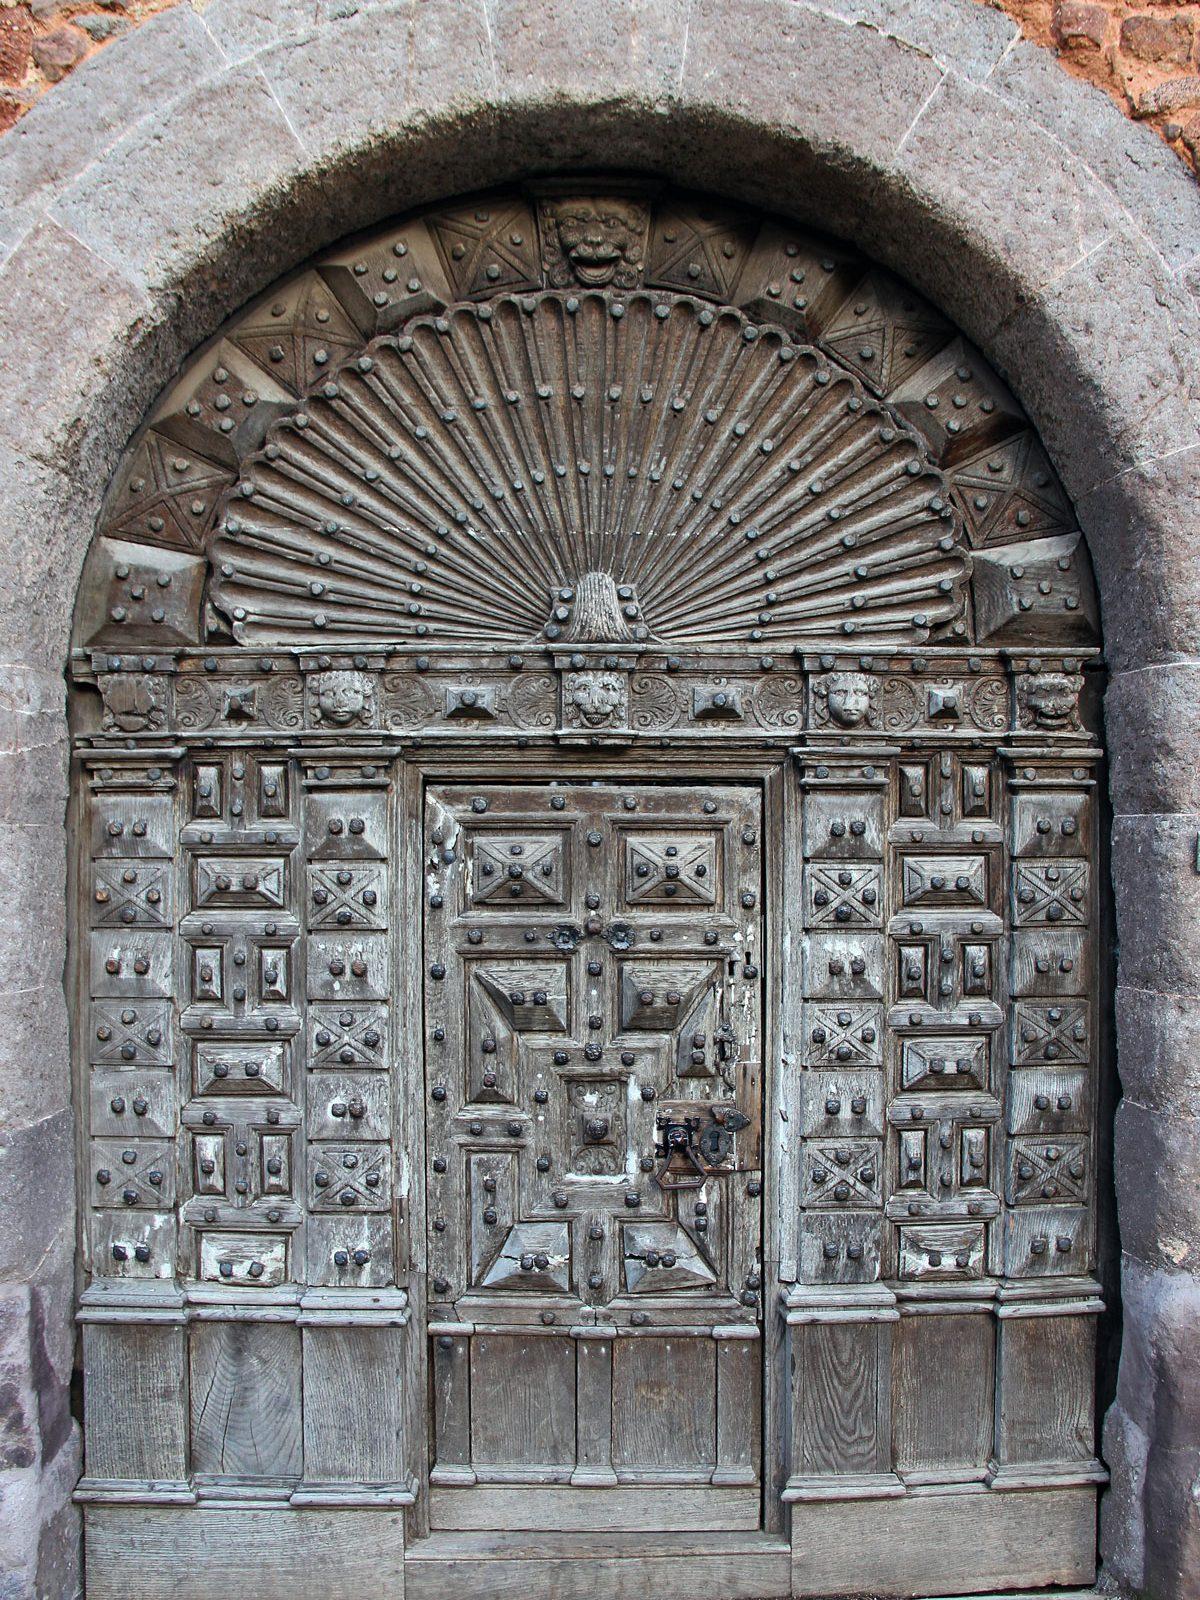 Archdeacon of Barnstaple's Doorway at No 11 Cathedral Close